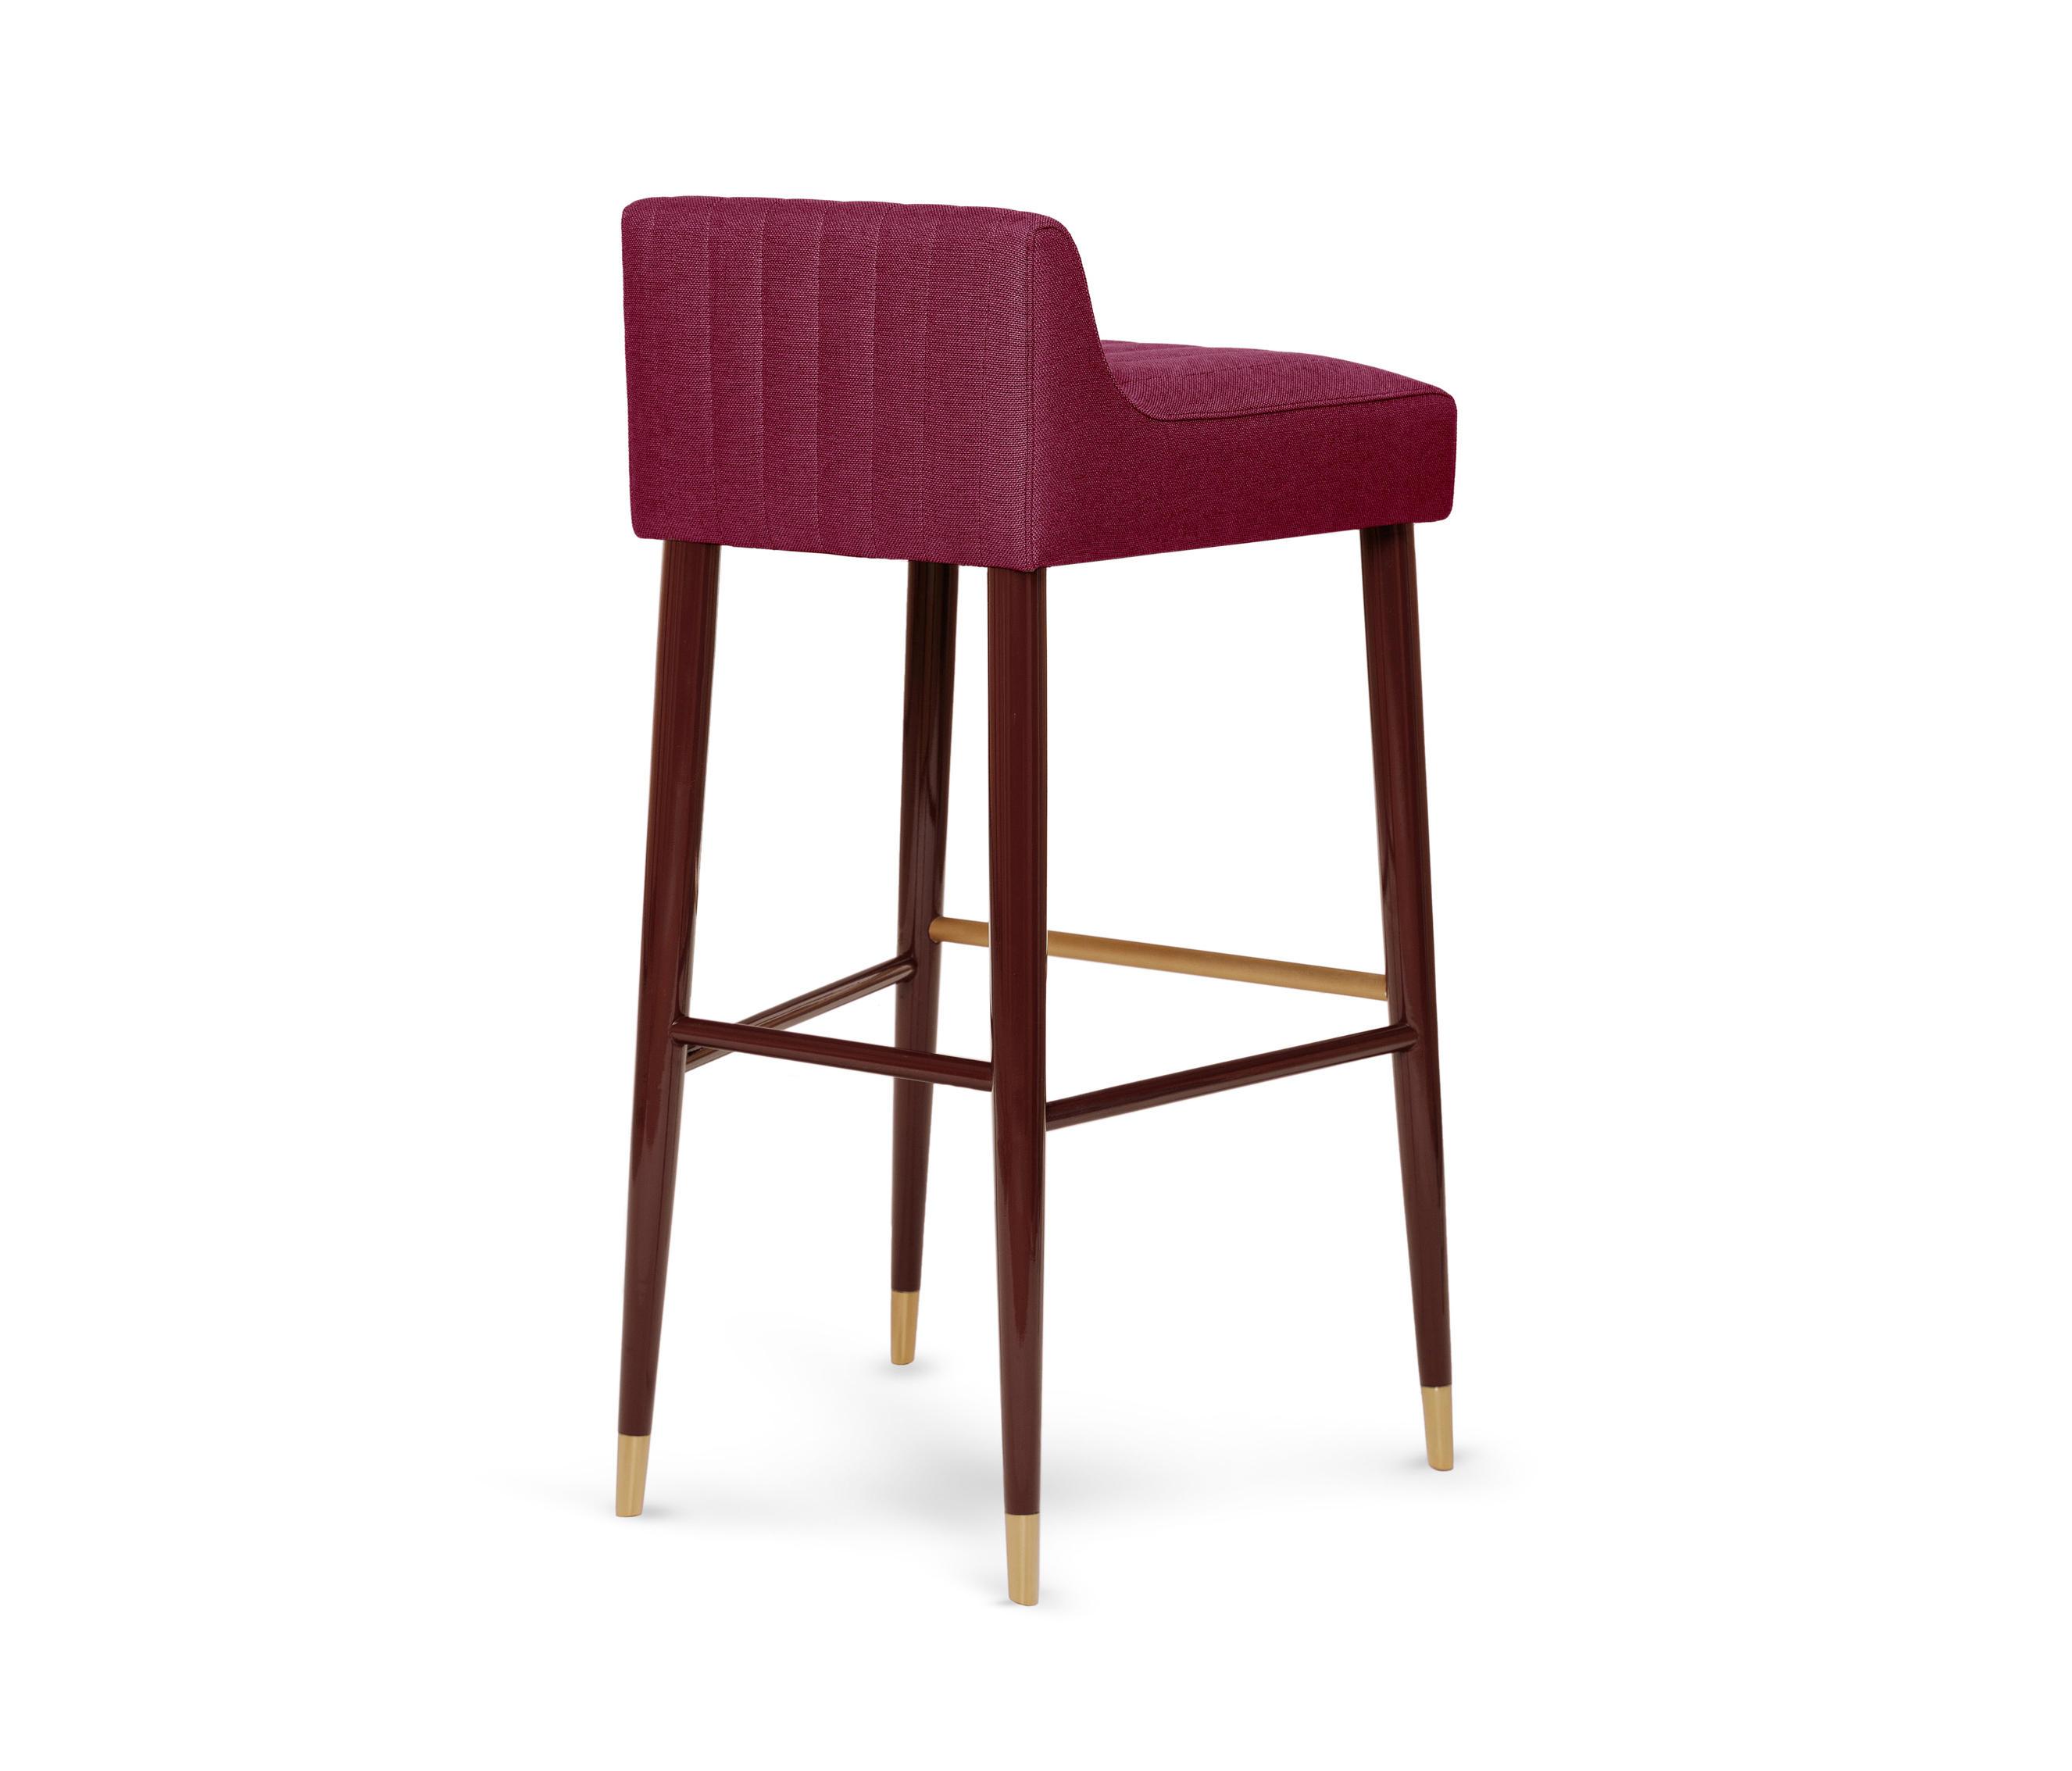 Astounding Charlotte Bar Stool Bar Stools From Munna Architonic Bralicious Painted Fabric Chair Ideas Braliciousco